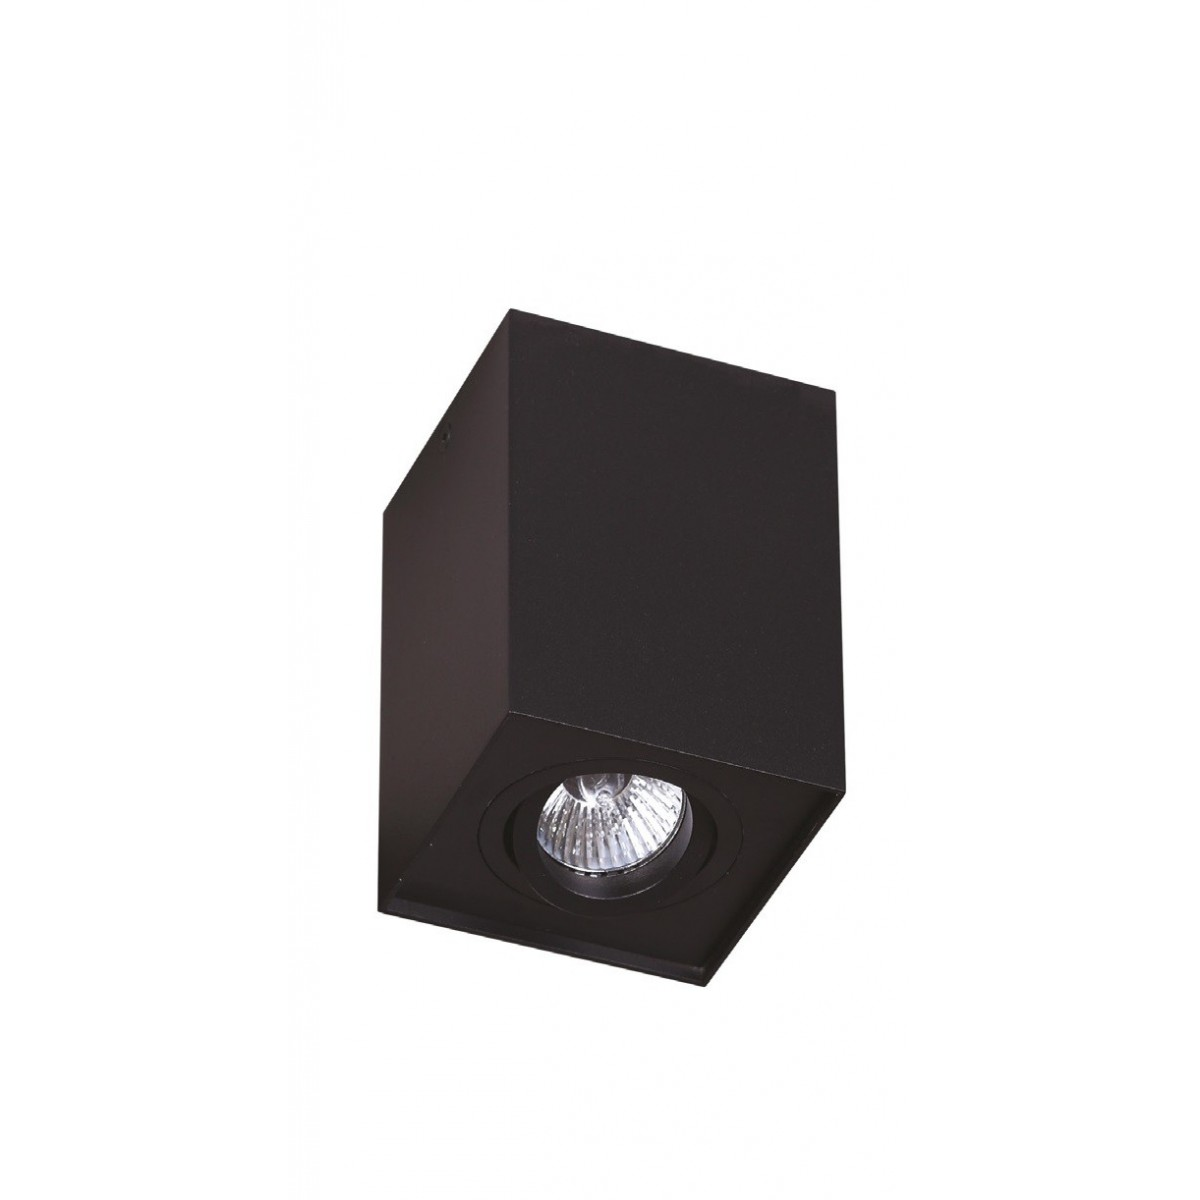 MAXlight BASIC SQUARE Czarny C0071 Sufitowa